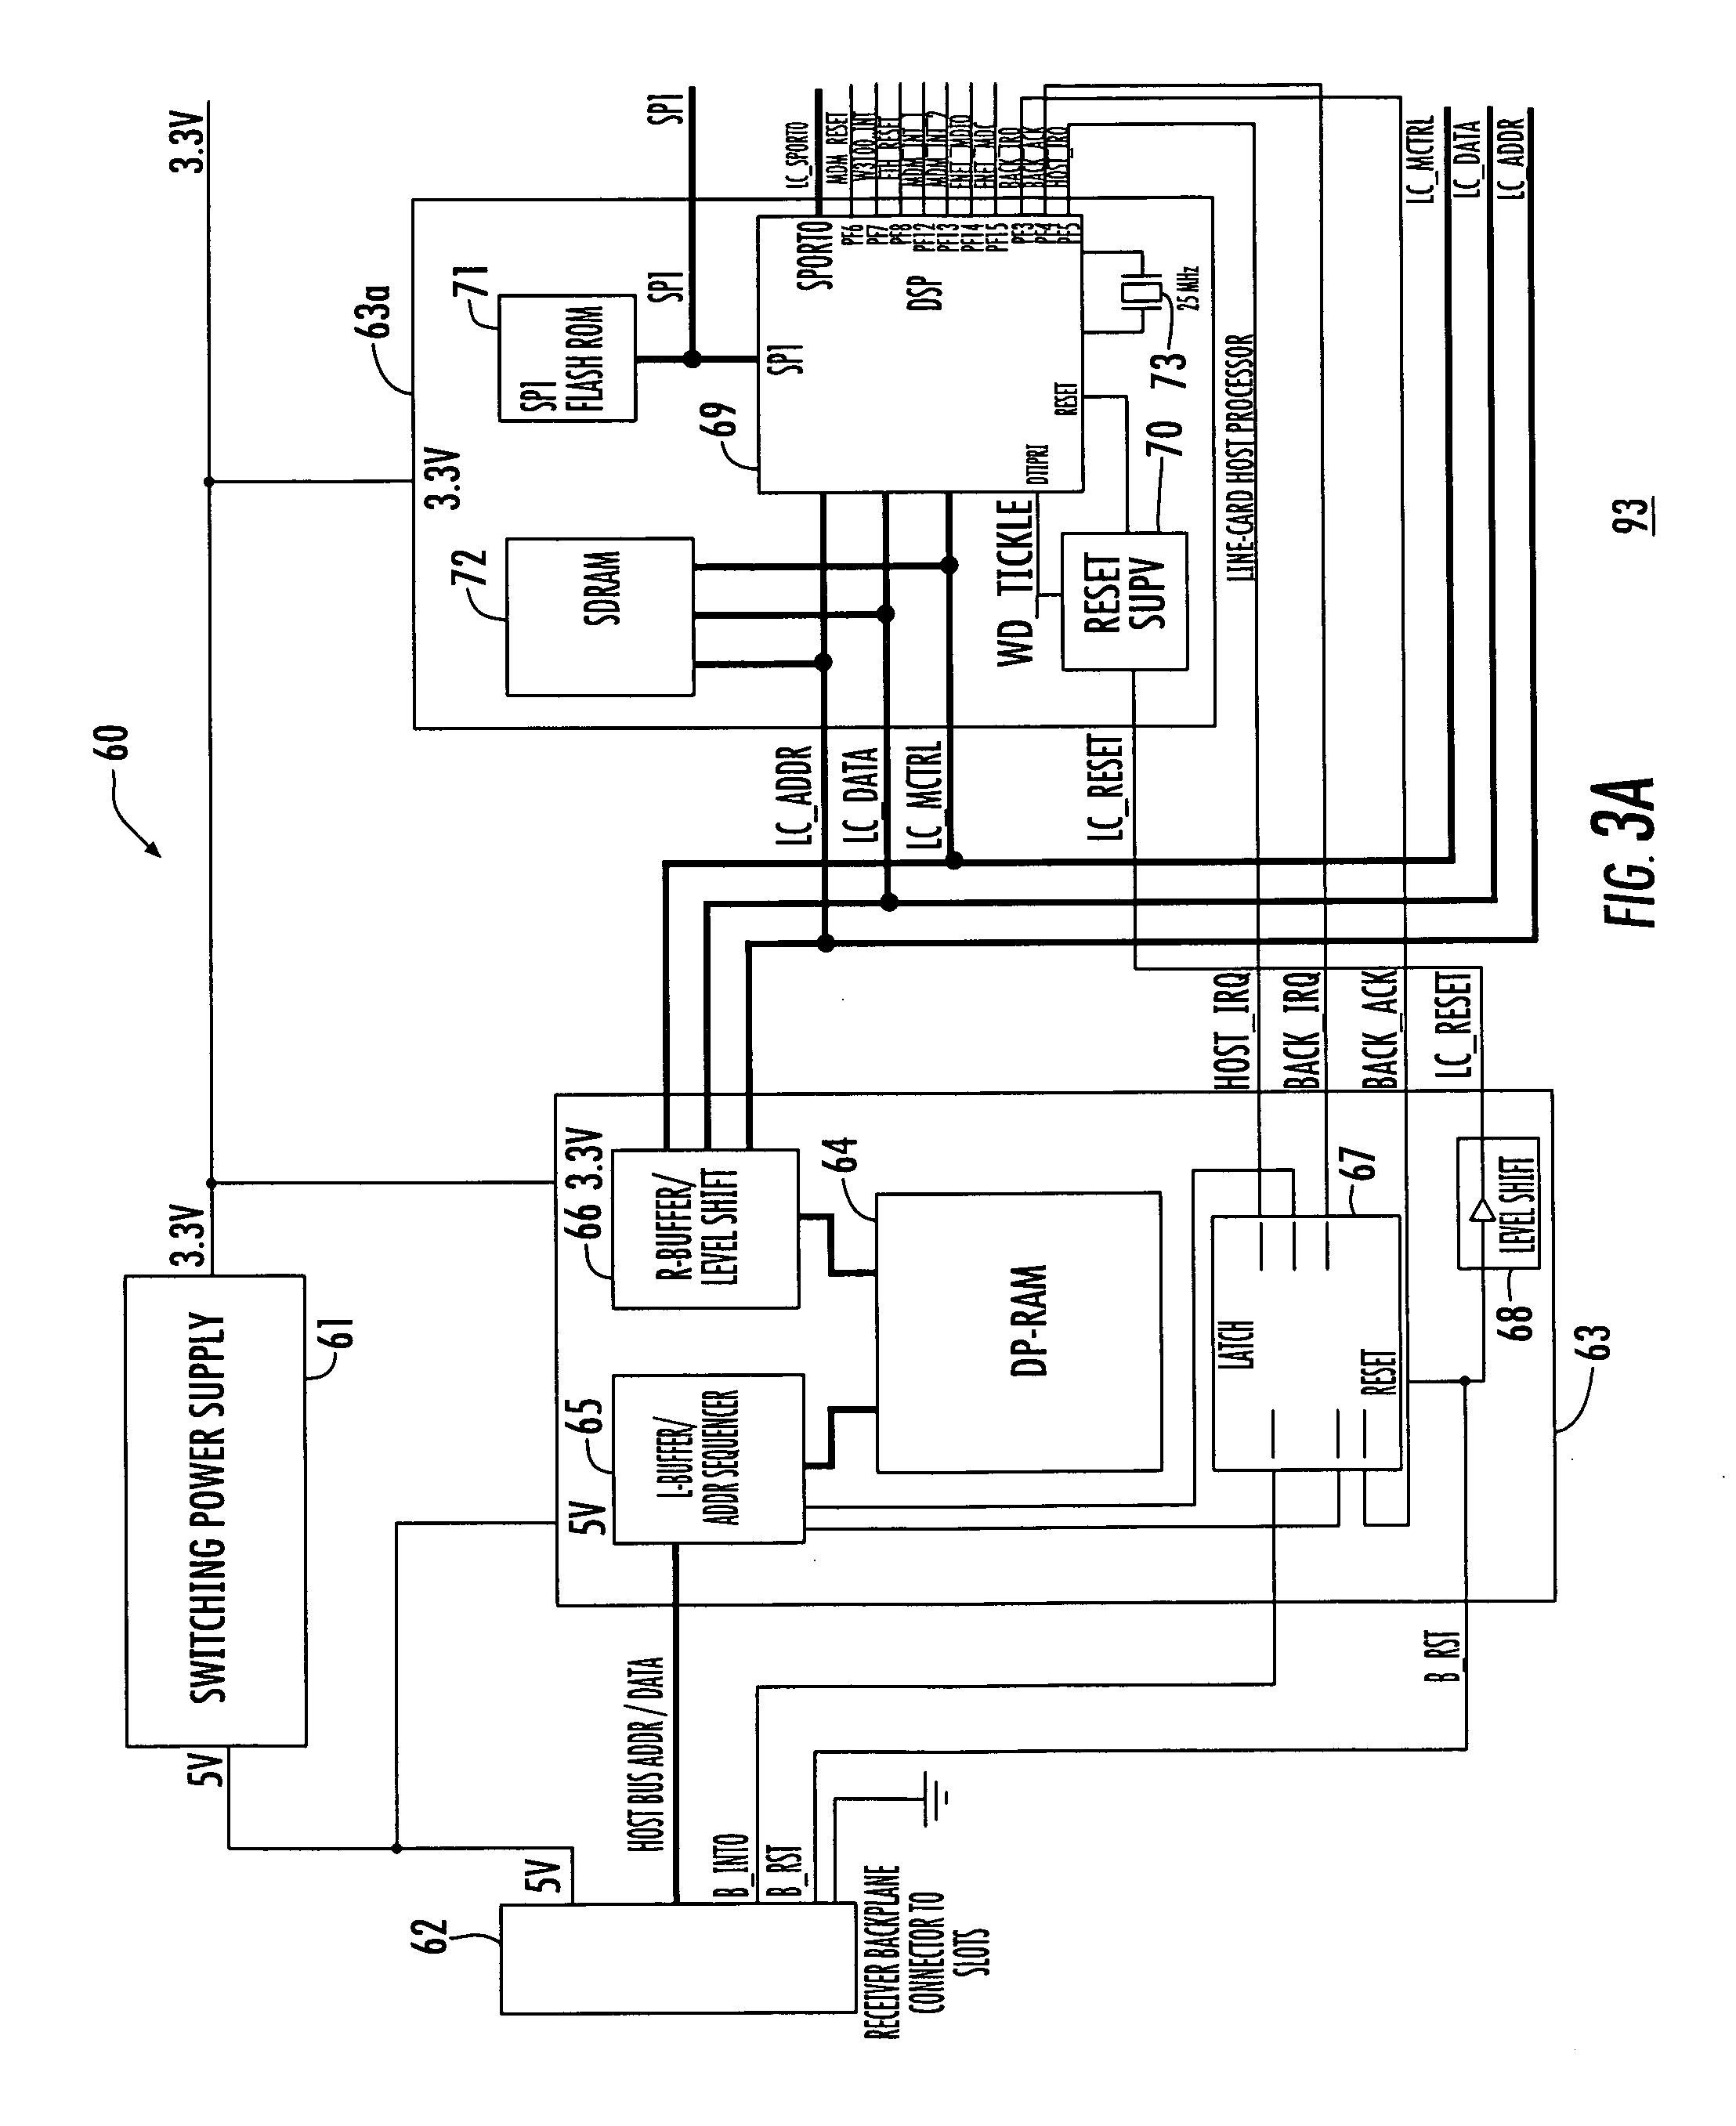 Addressable Smoke Detector Wiring Diagram Wiring Diagram